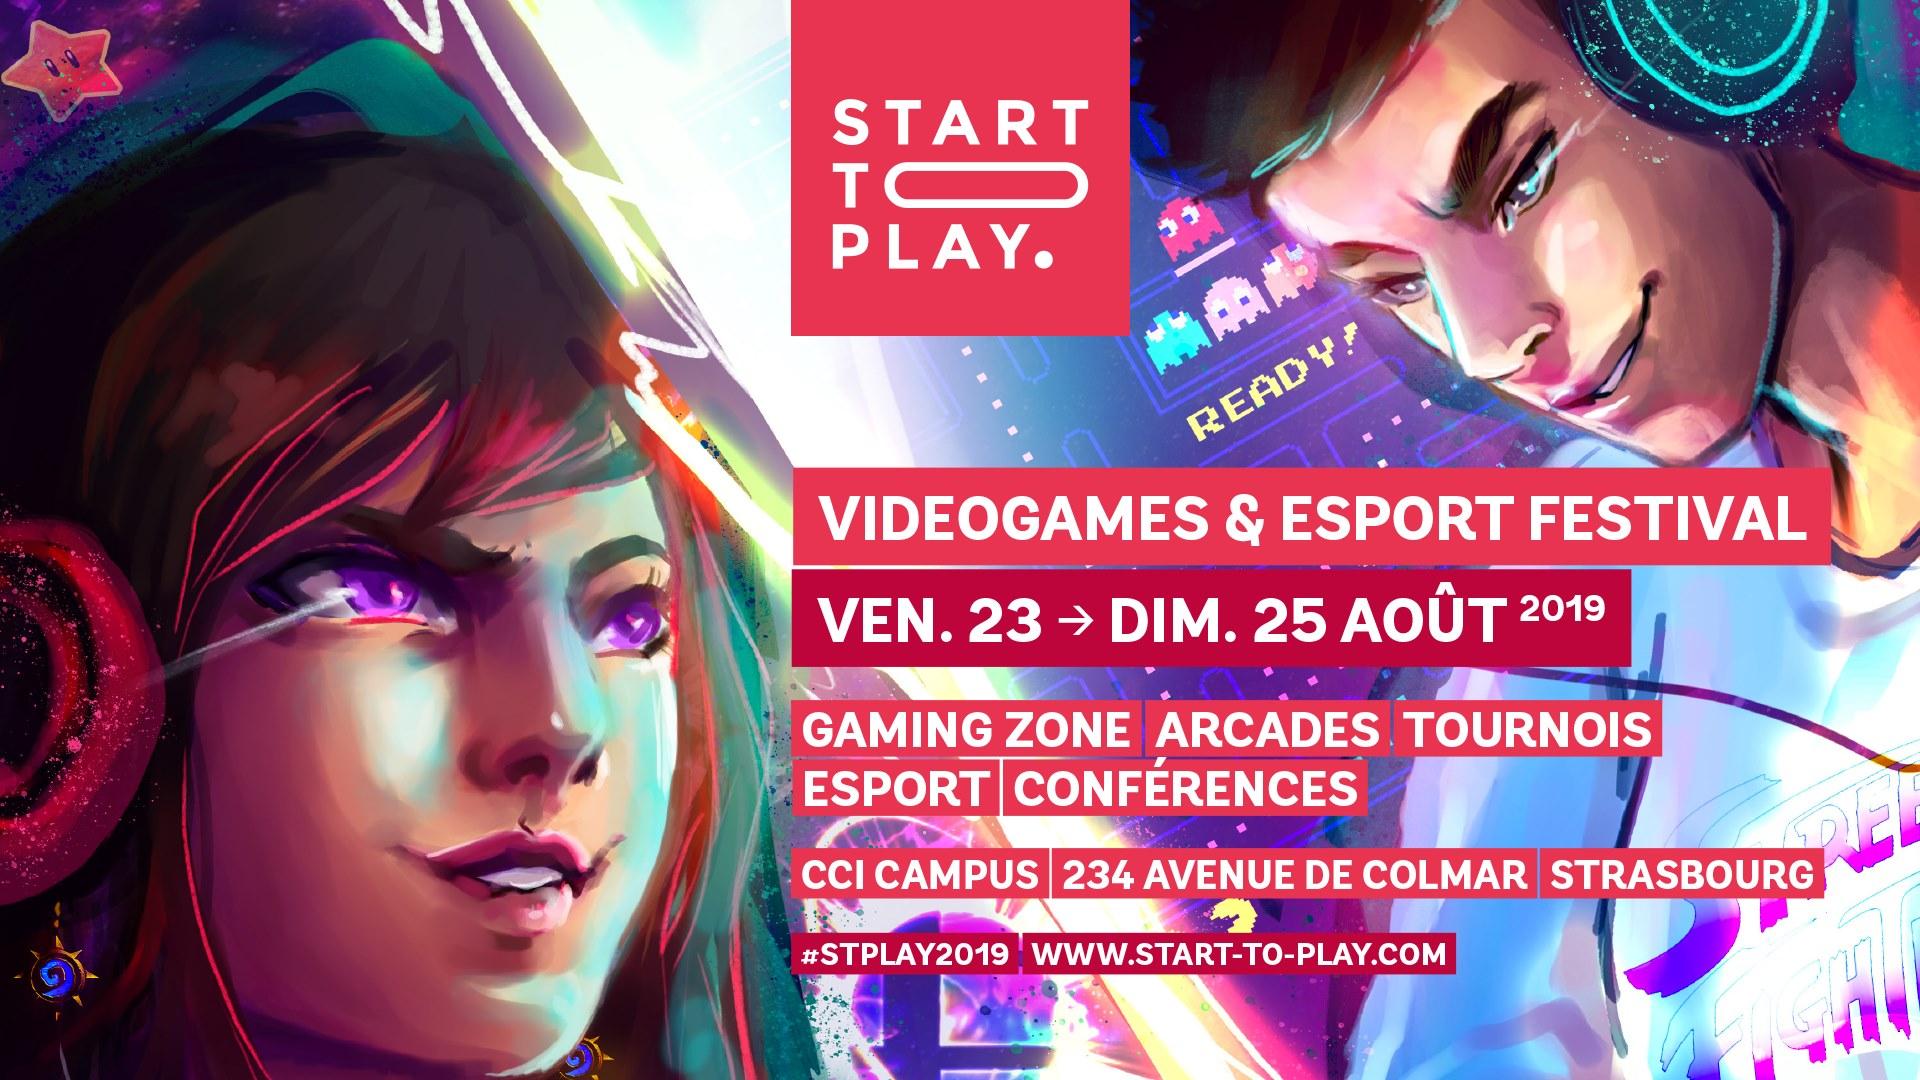 [ÉVÉNEMENT] Start To Play 2019 – Videogames & Esport Festival